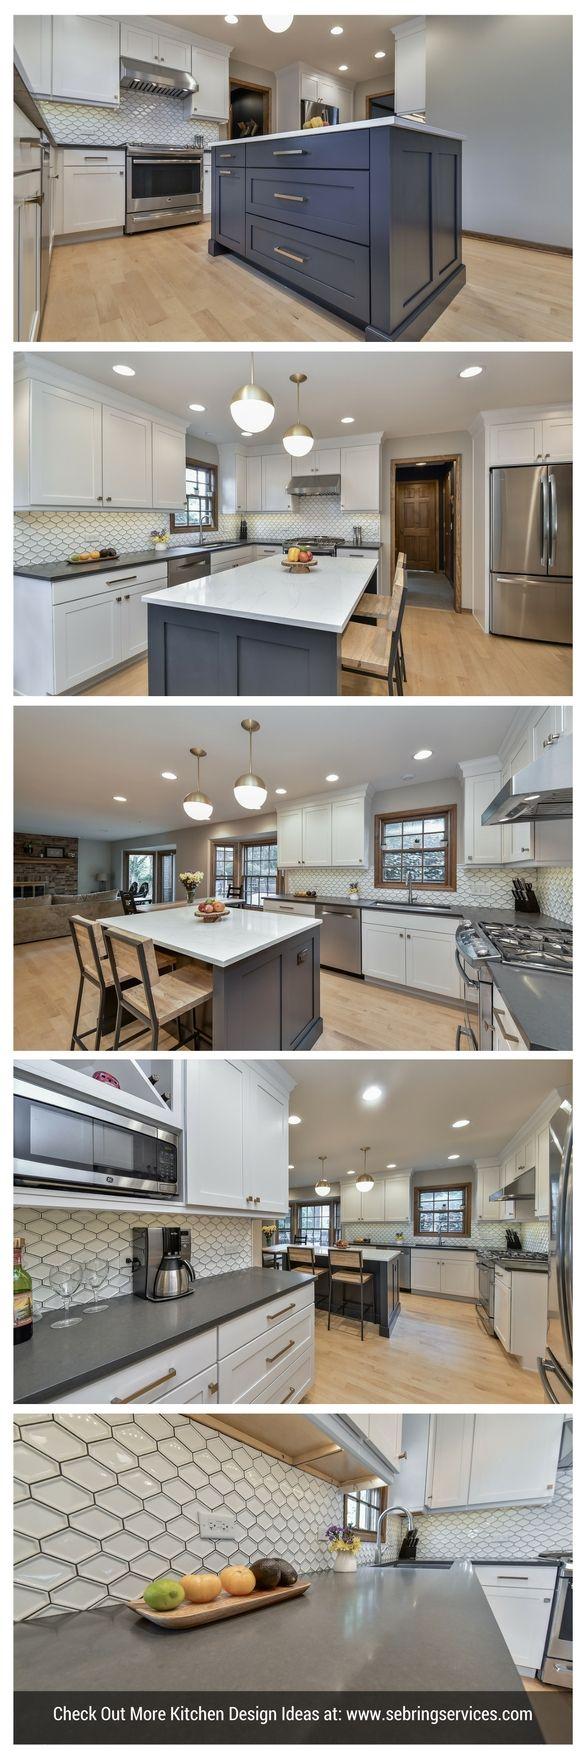 114 best Kitchens: Hutch Cabinets images on Pinterest | Remodeling ...